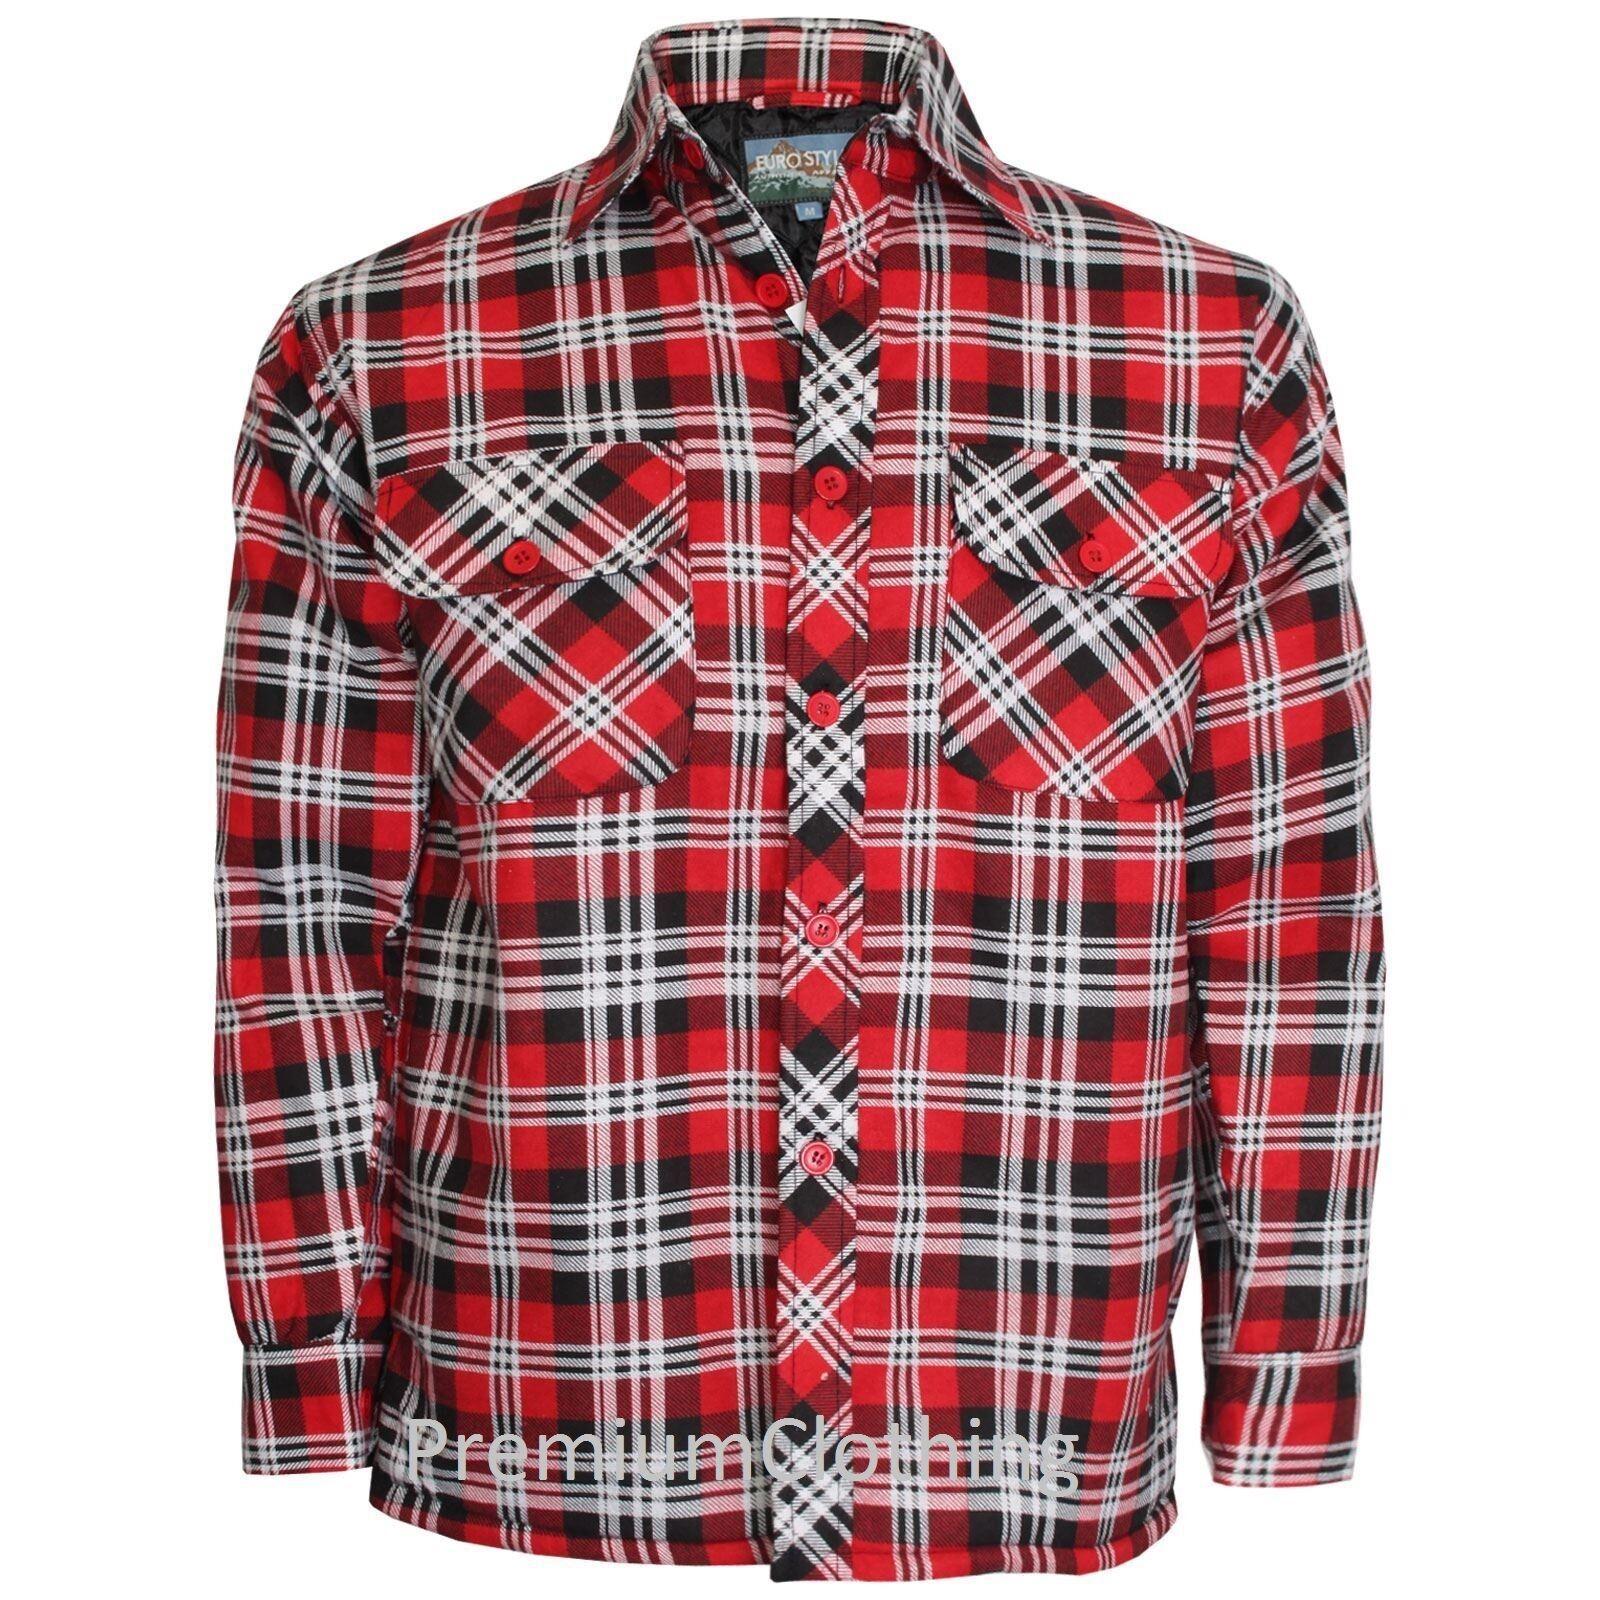 Casual À Chemise Homme Lumberjack Flanelle Carreaux Sqwn41